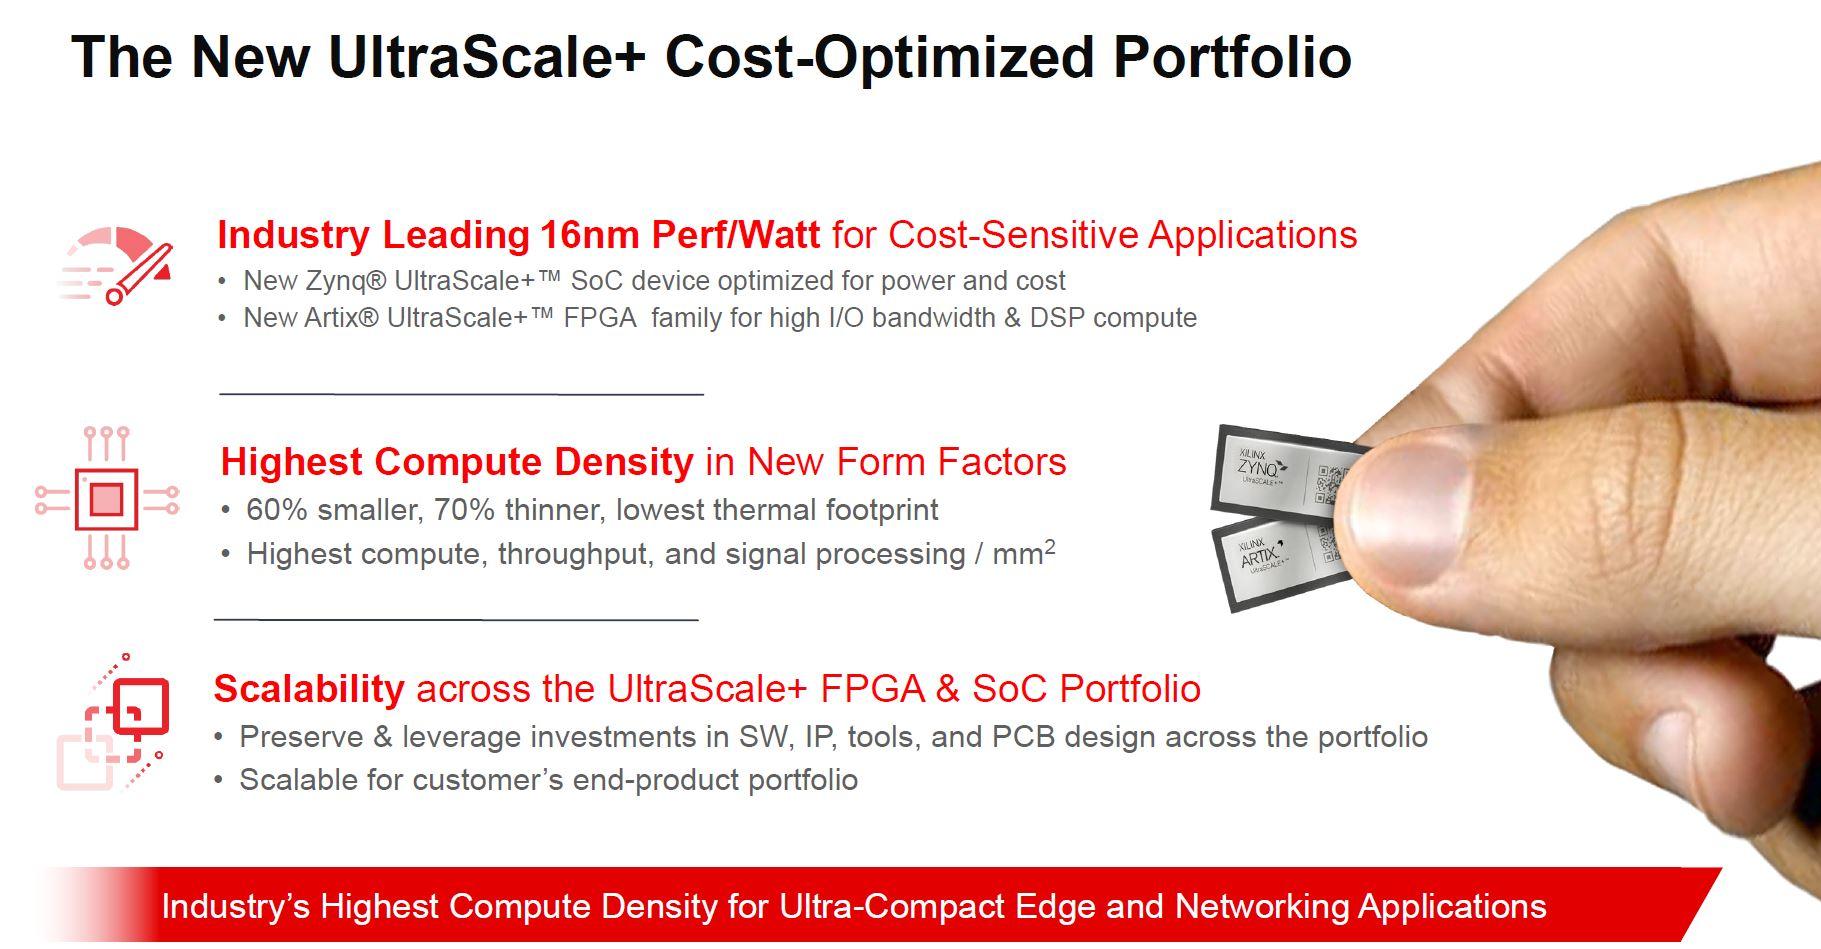 Xilinx Zynq And Artix UltraScale+ Cost Optimized Portfolio